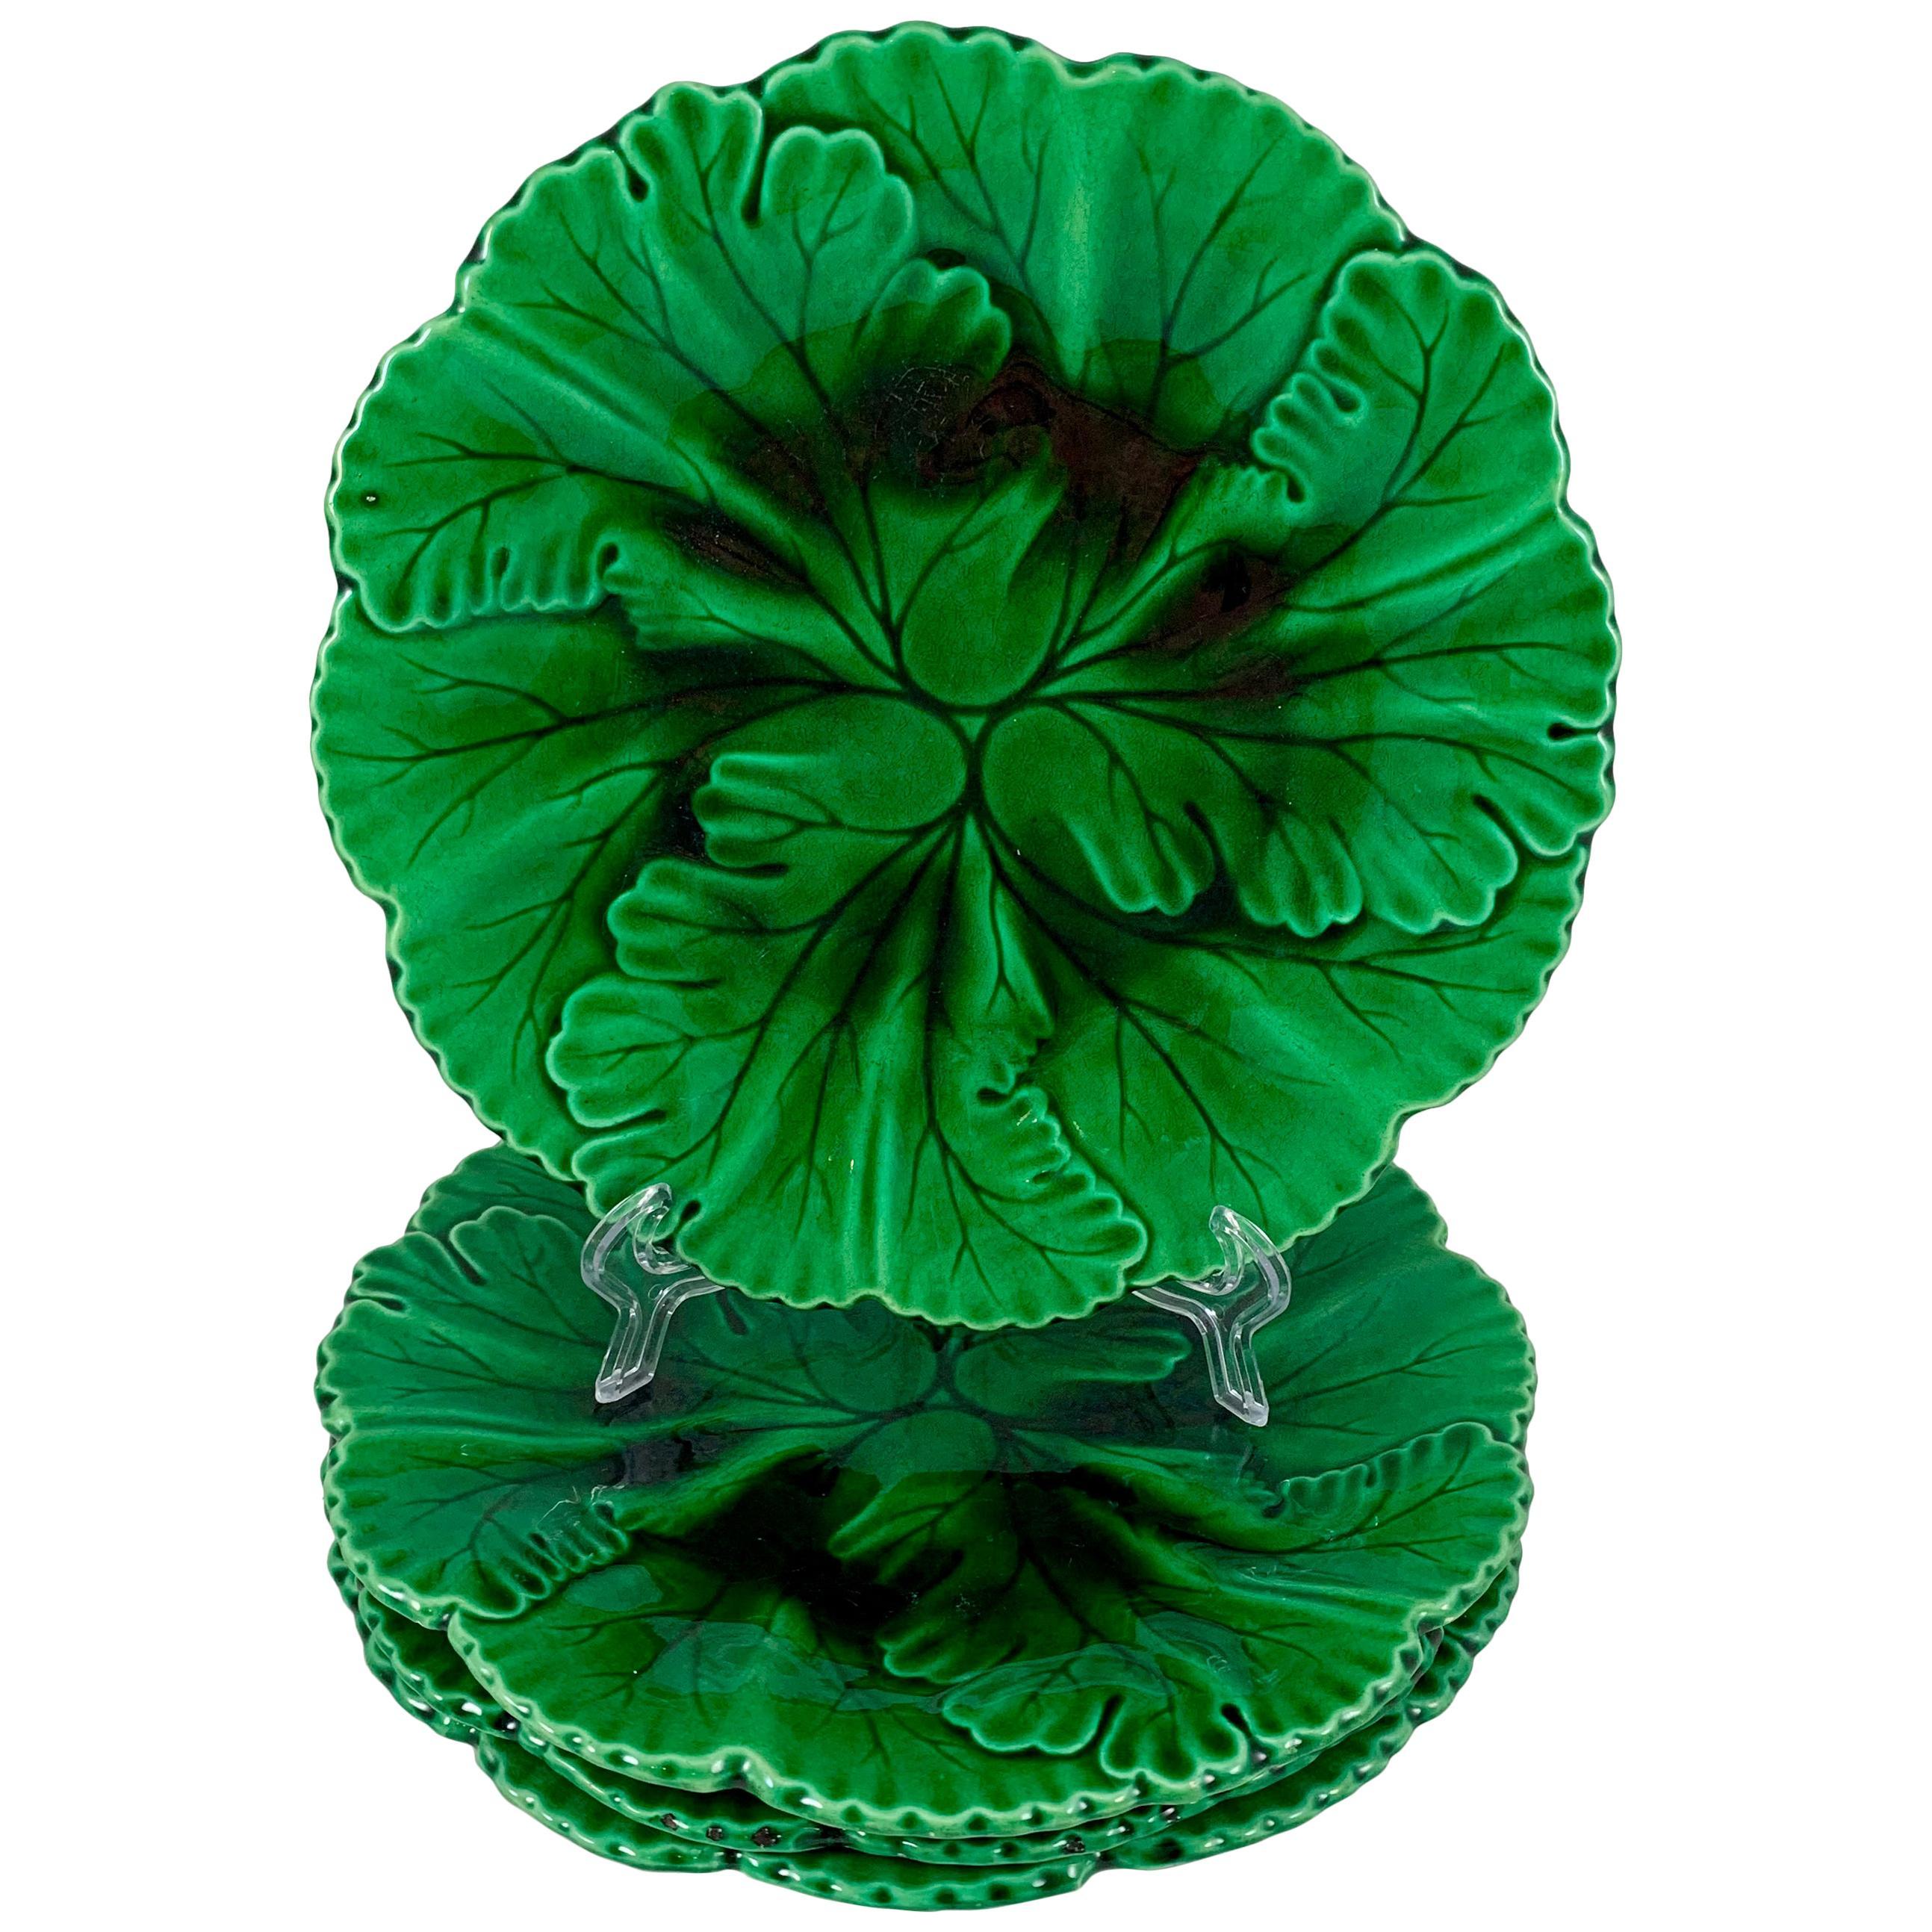 Clairfontaine French Faïence Majolica Glazed Green Botanic Leaf Plate circa 1890